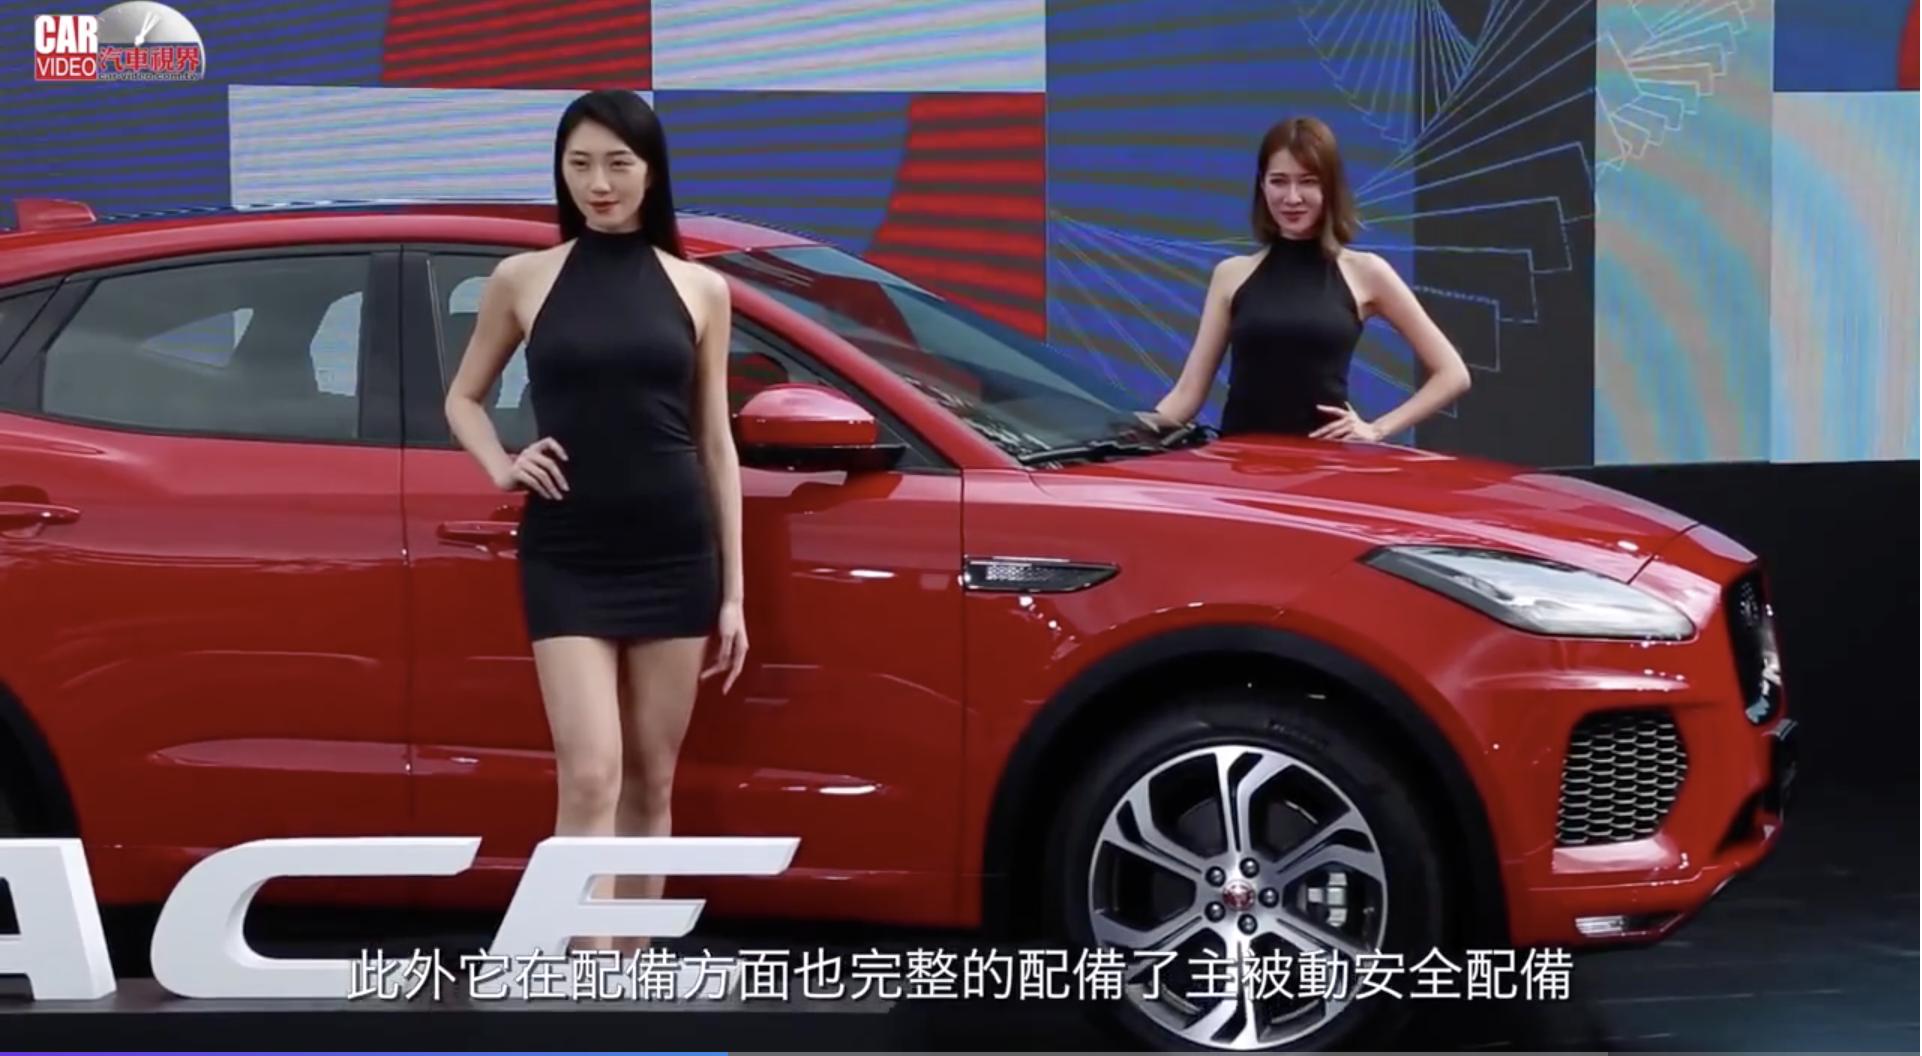 逆襲平凡 NEW JAGUAR E-PACE COMPACT SUV發表